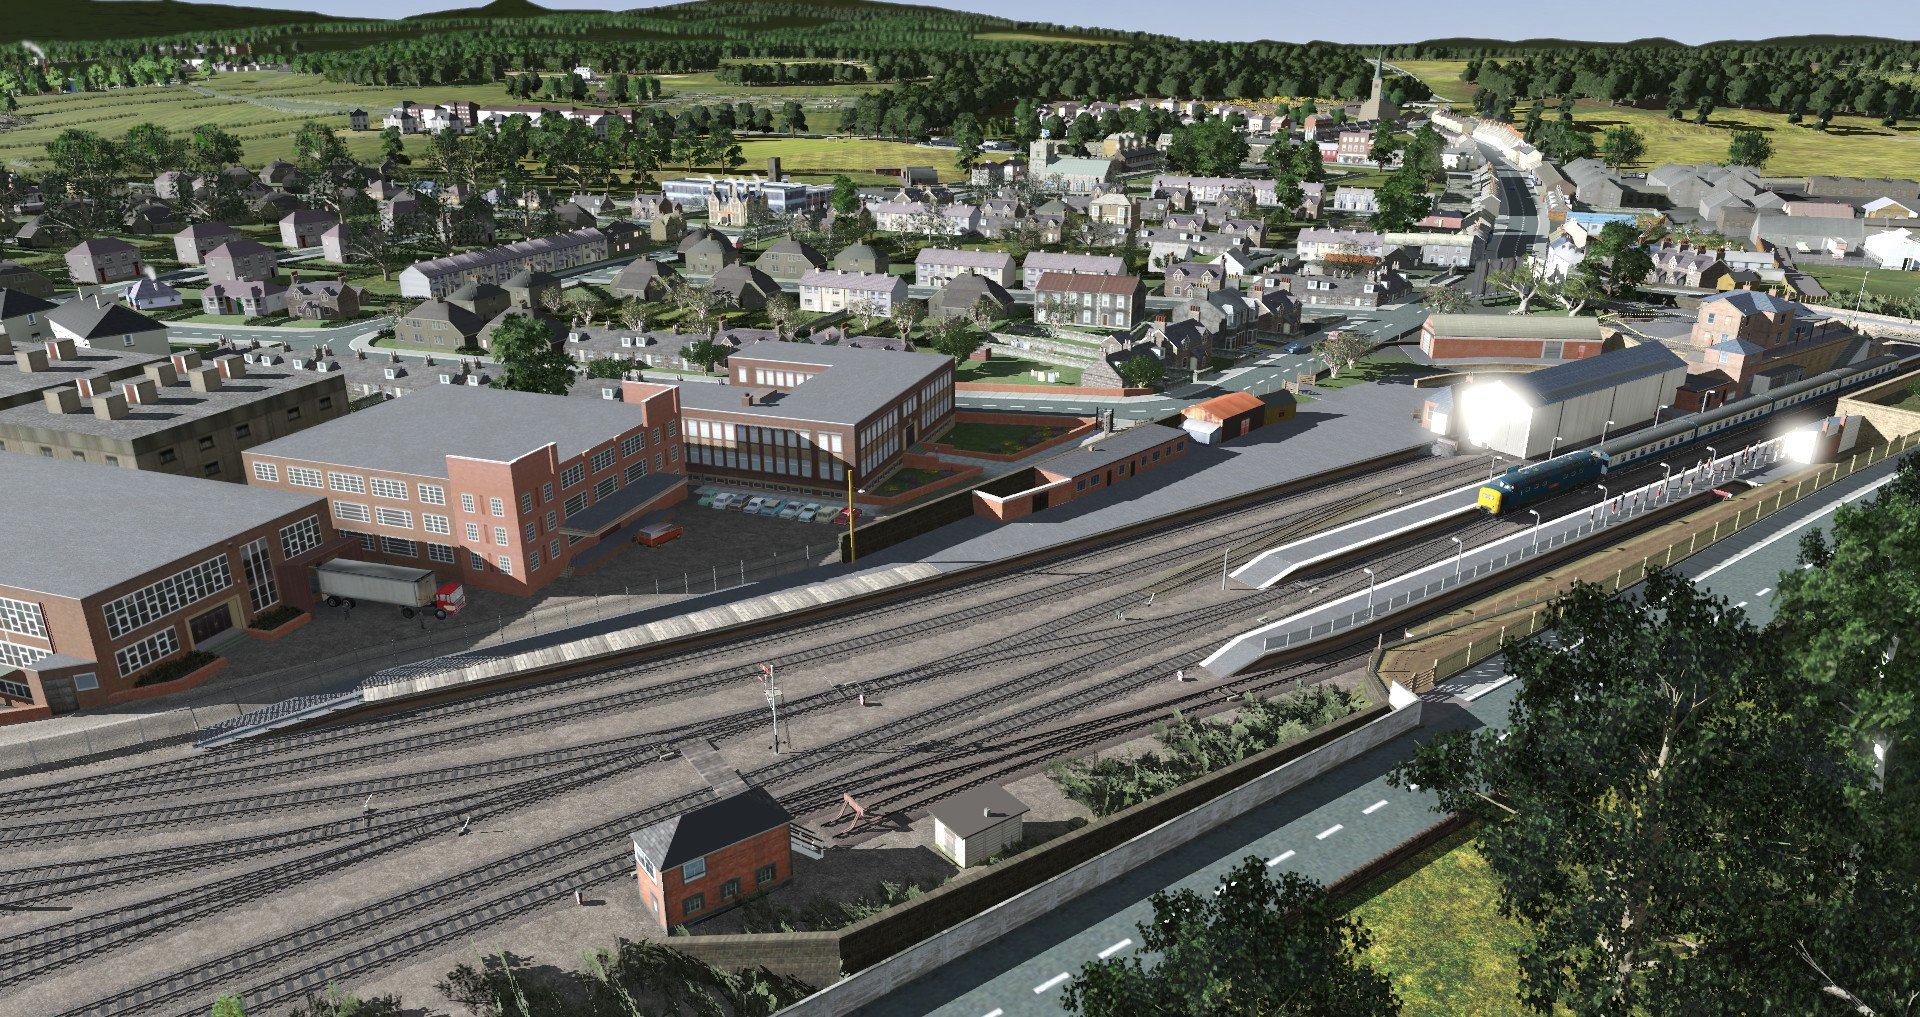 Trainz Railroad Simulator 2019 Free Download